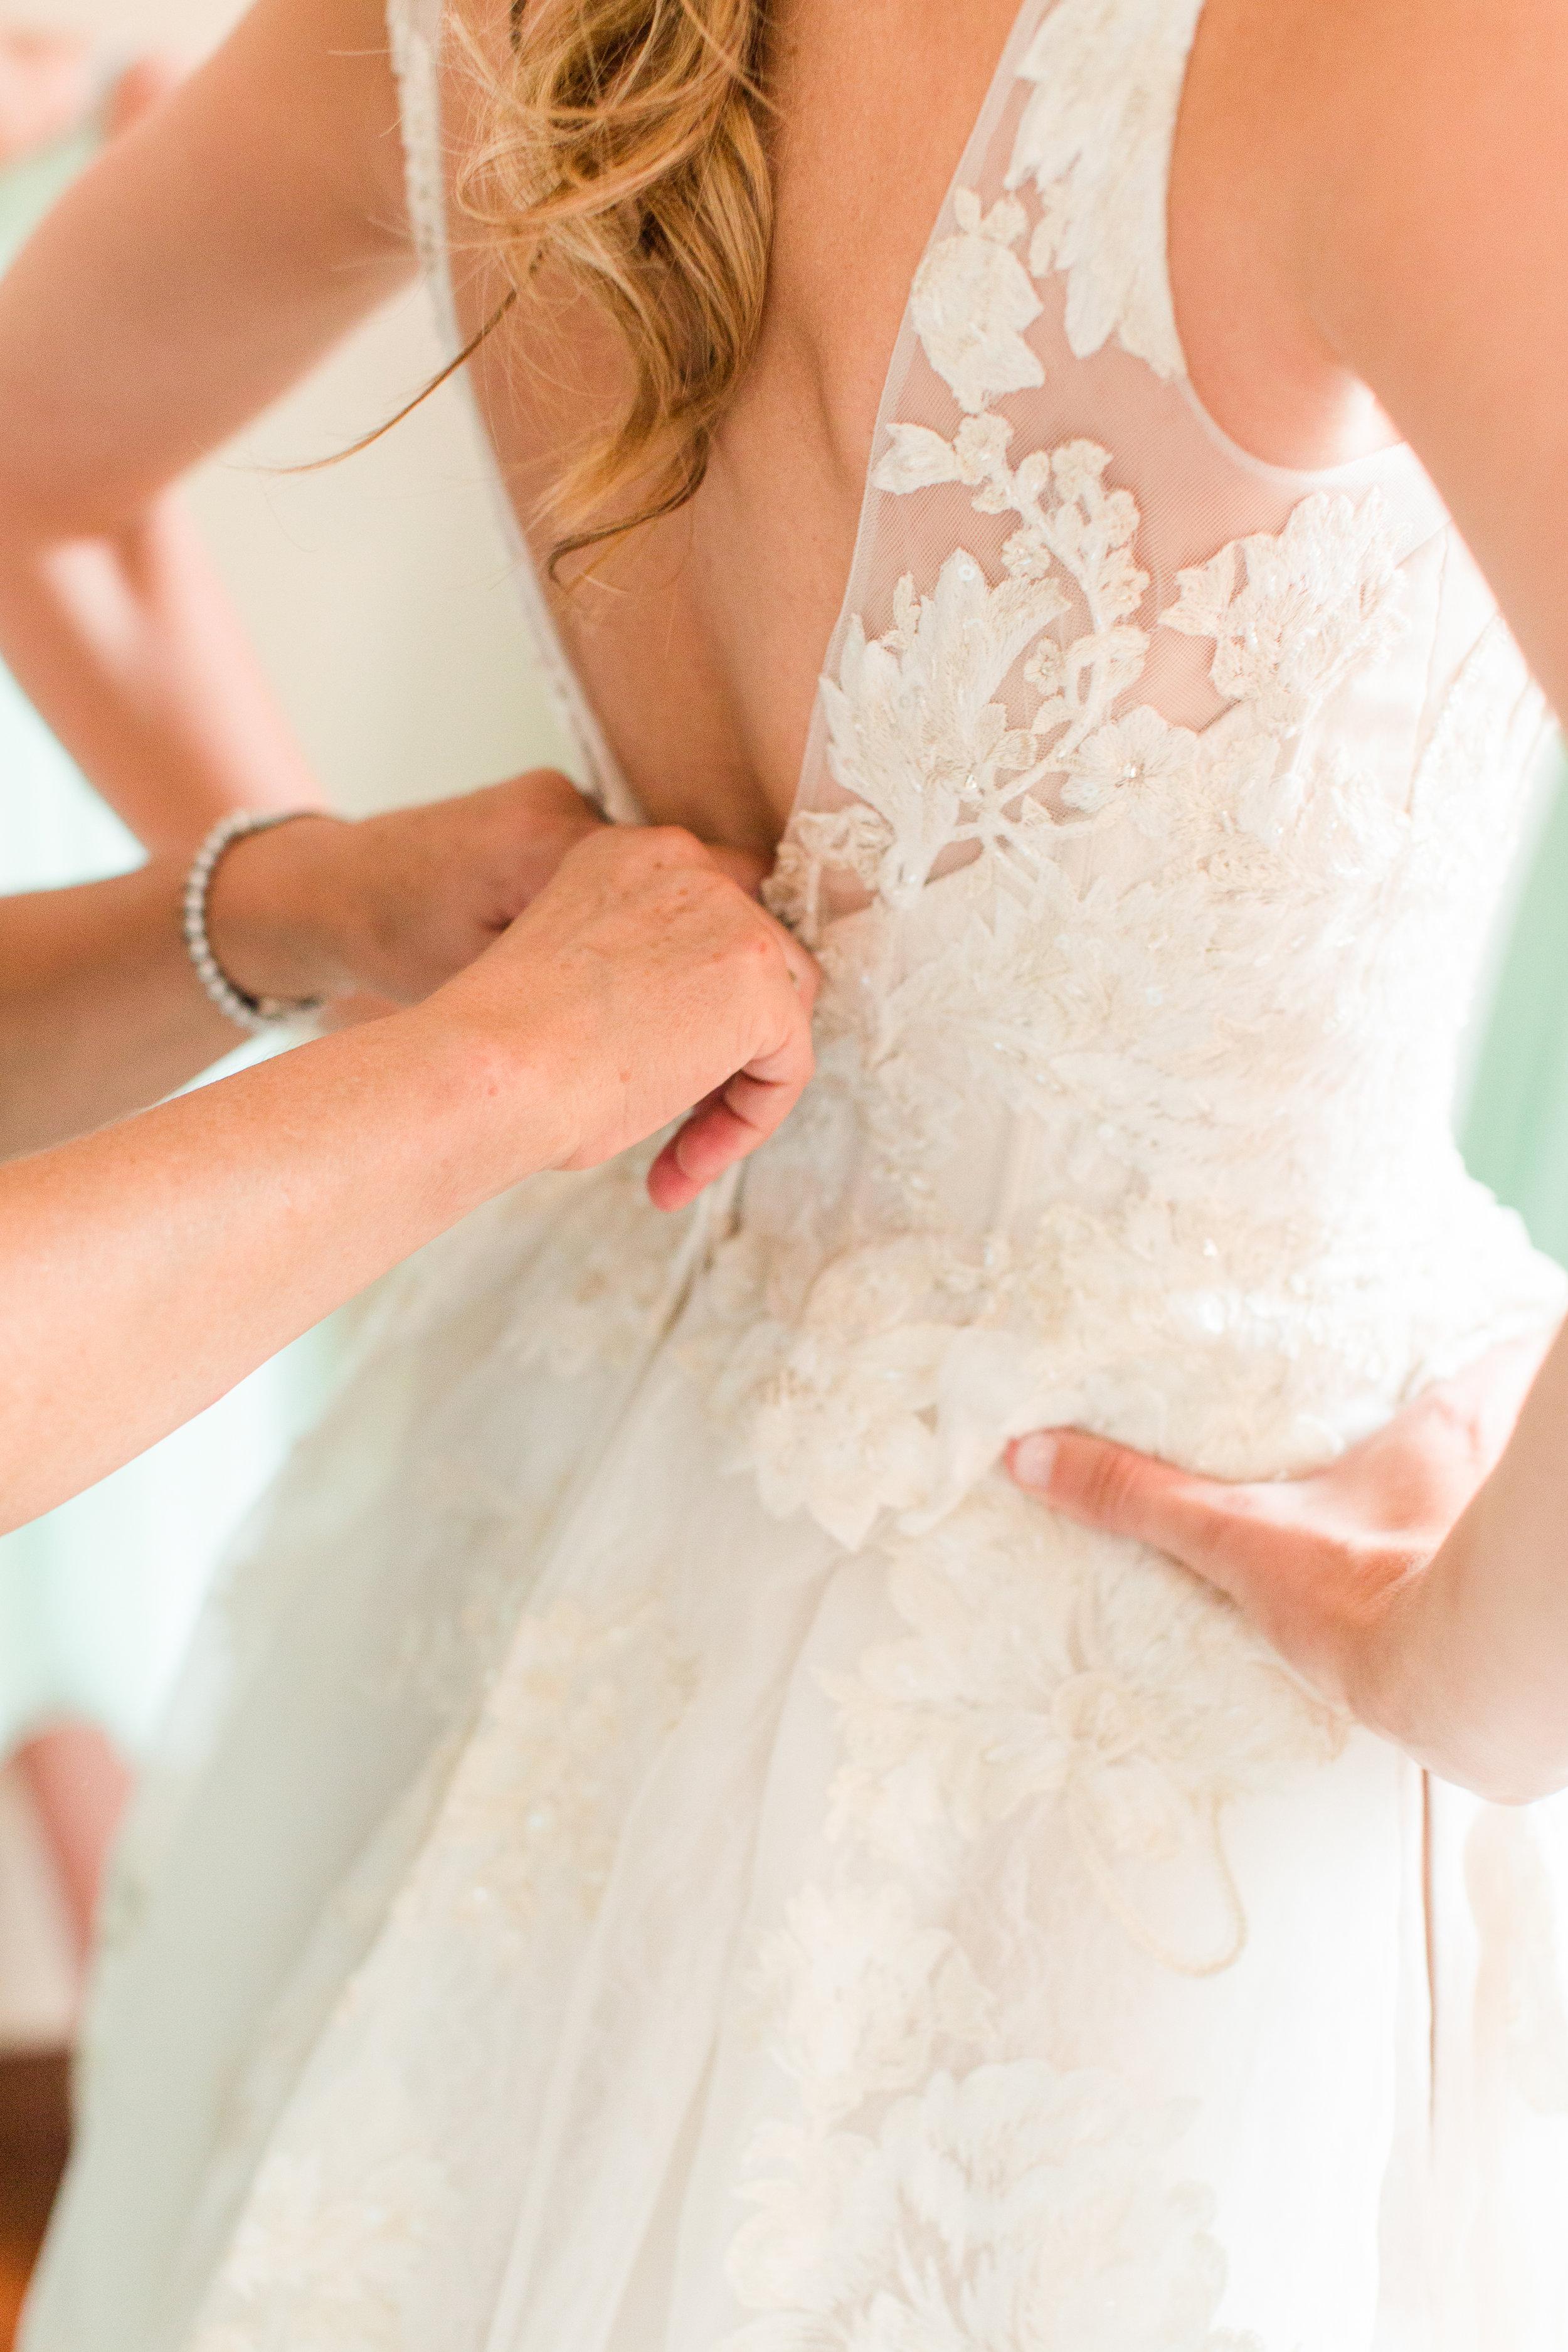 Lace Lowback Wedding Dress - West Virginia Wedding Photographer - Wedding Venue